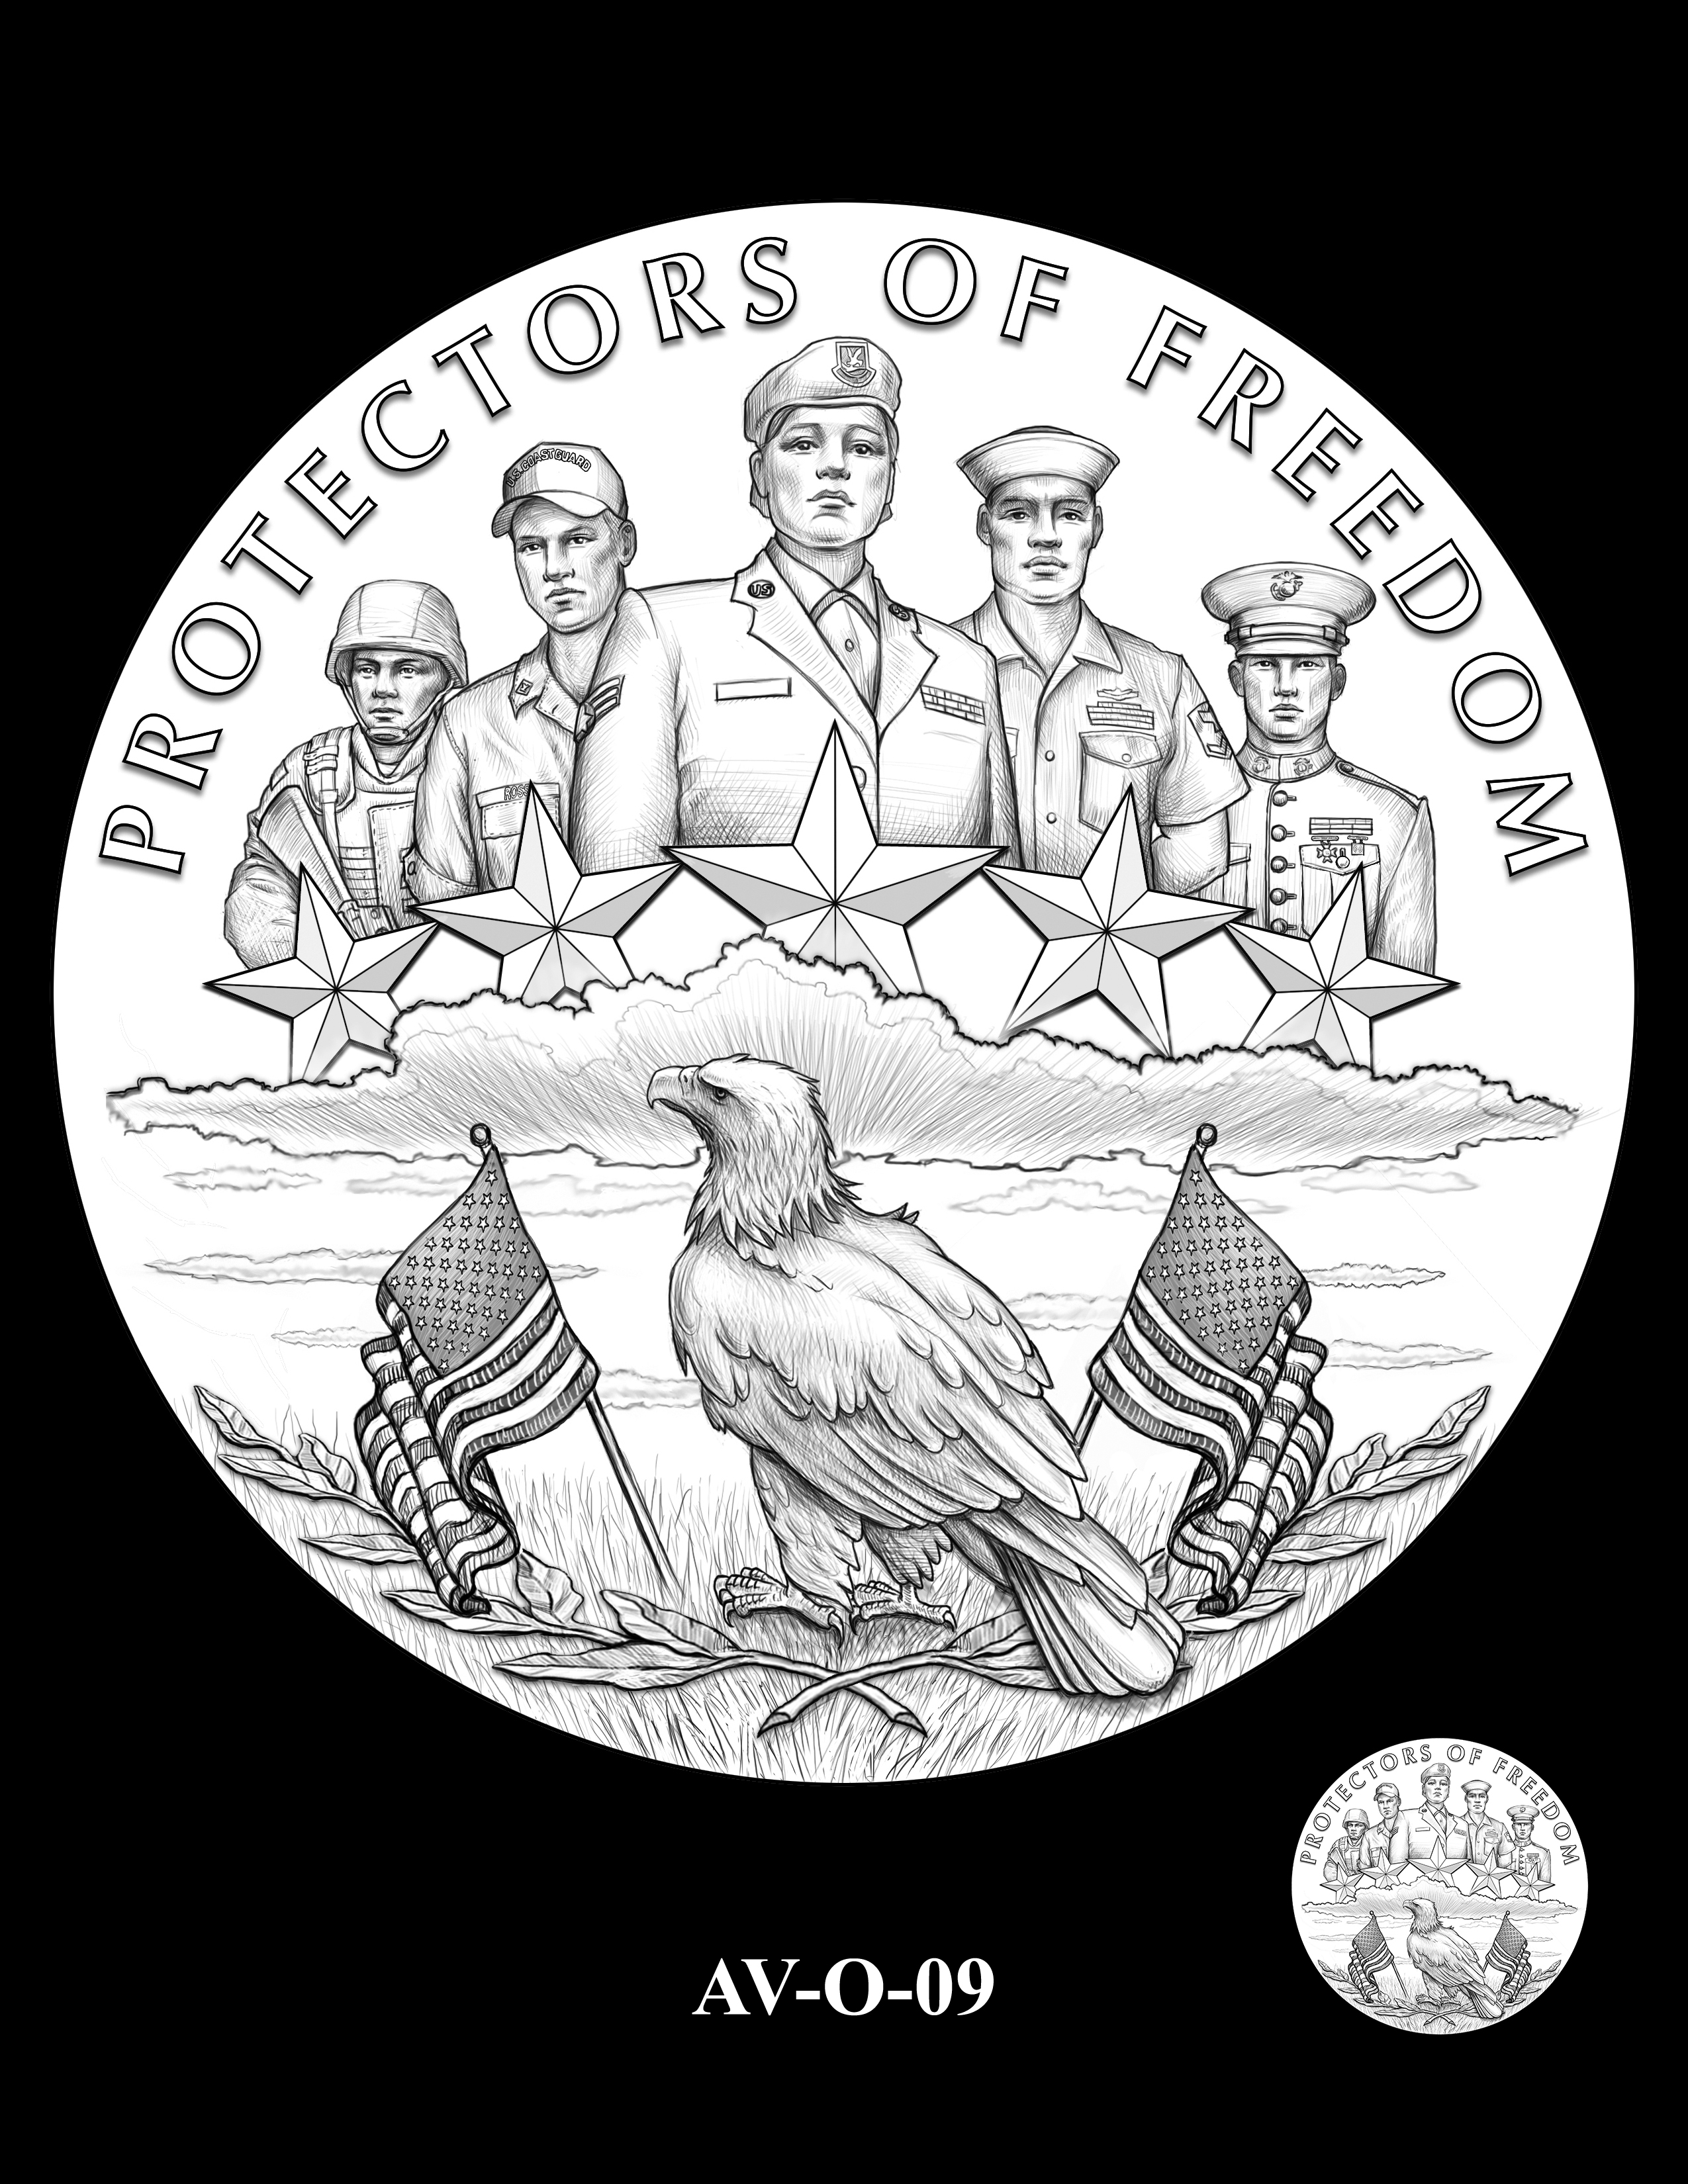 AV-O-09 - American Veterans Medal